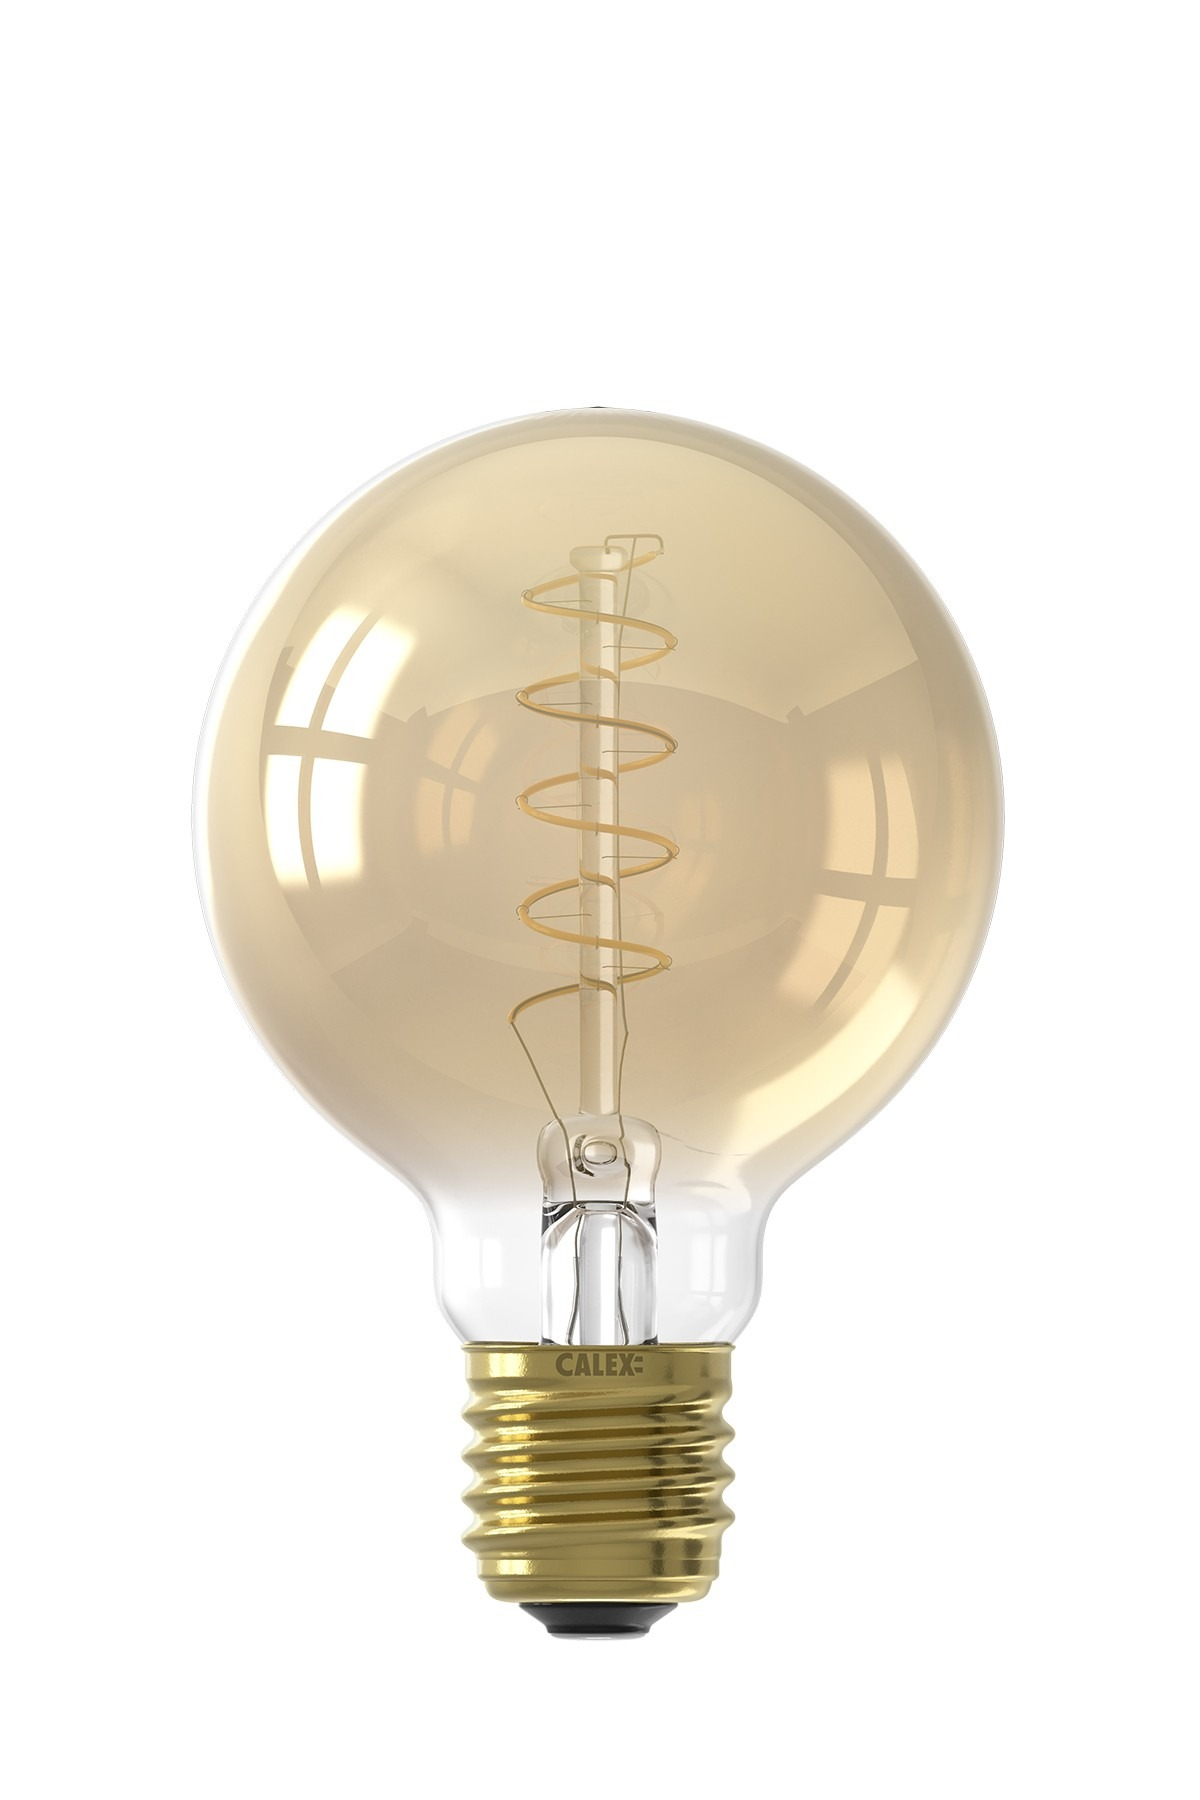 Calex E27 LED Spiral G80 Globe Bulb (Dimmable)